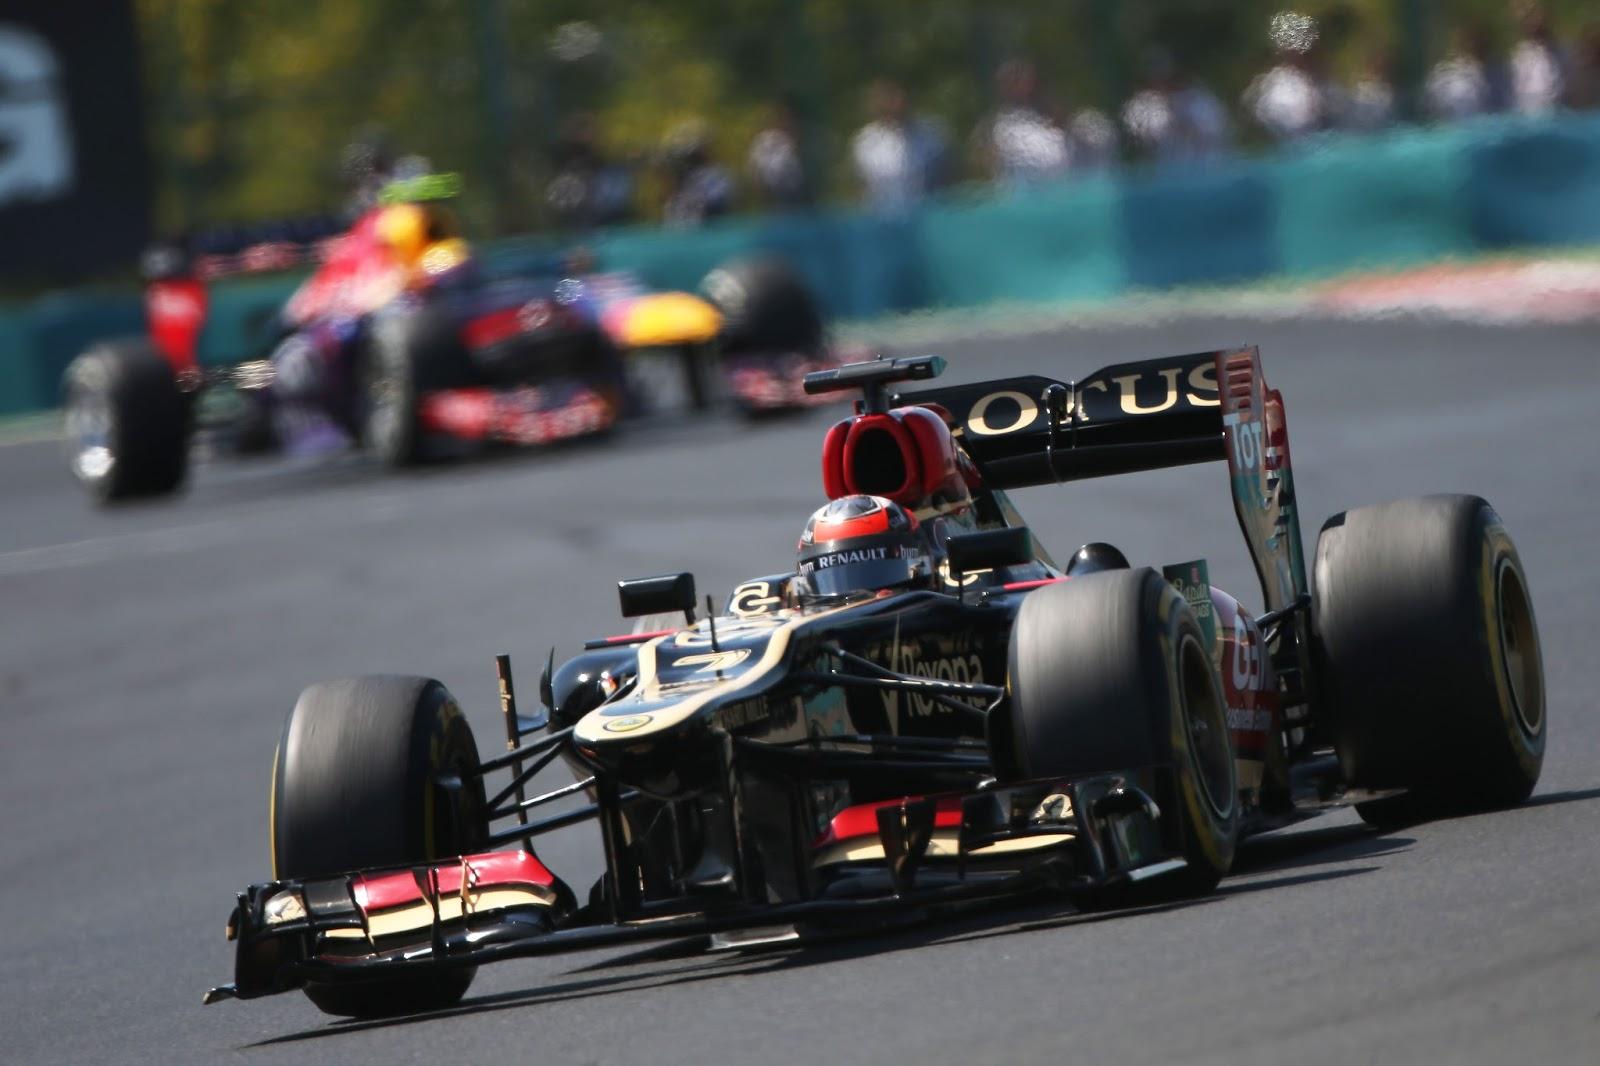 F1 News - Magazine cover